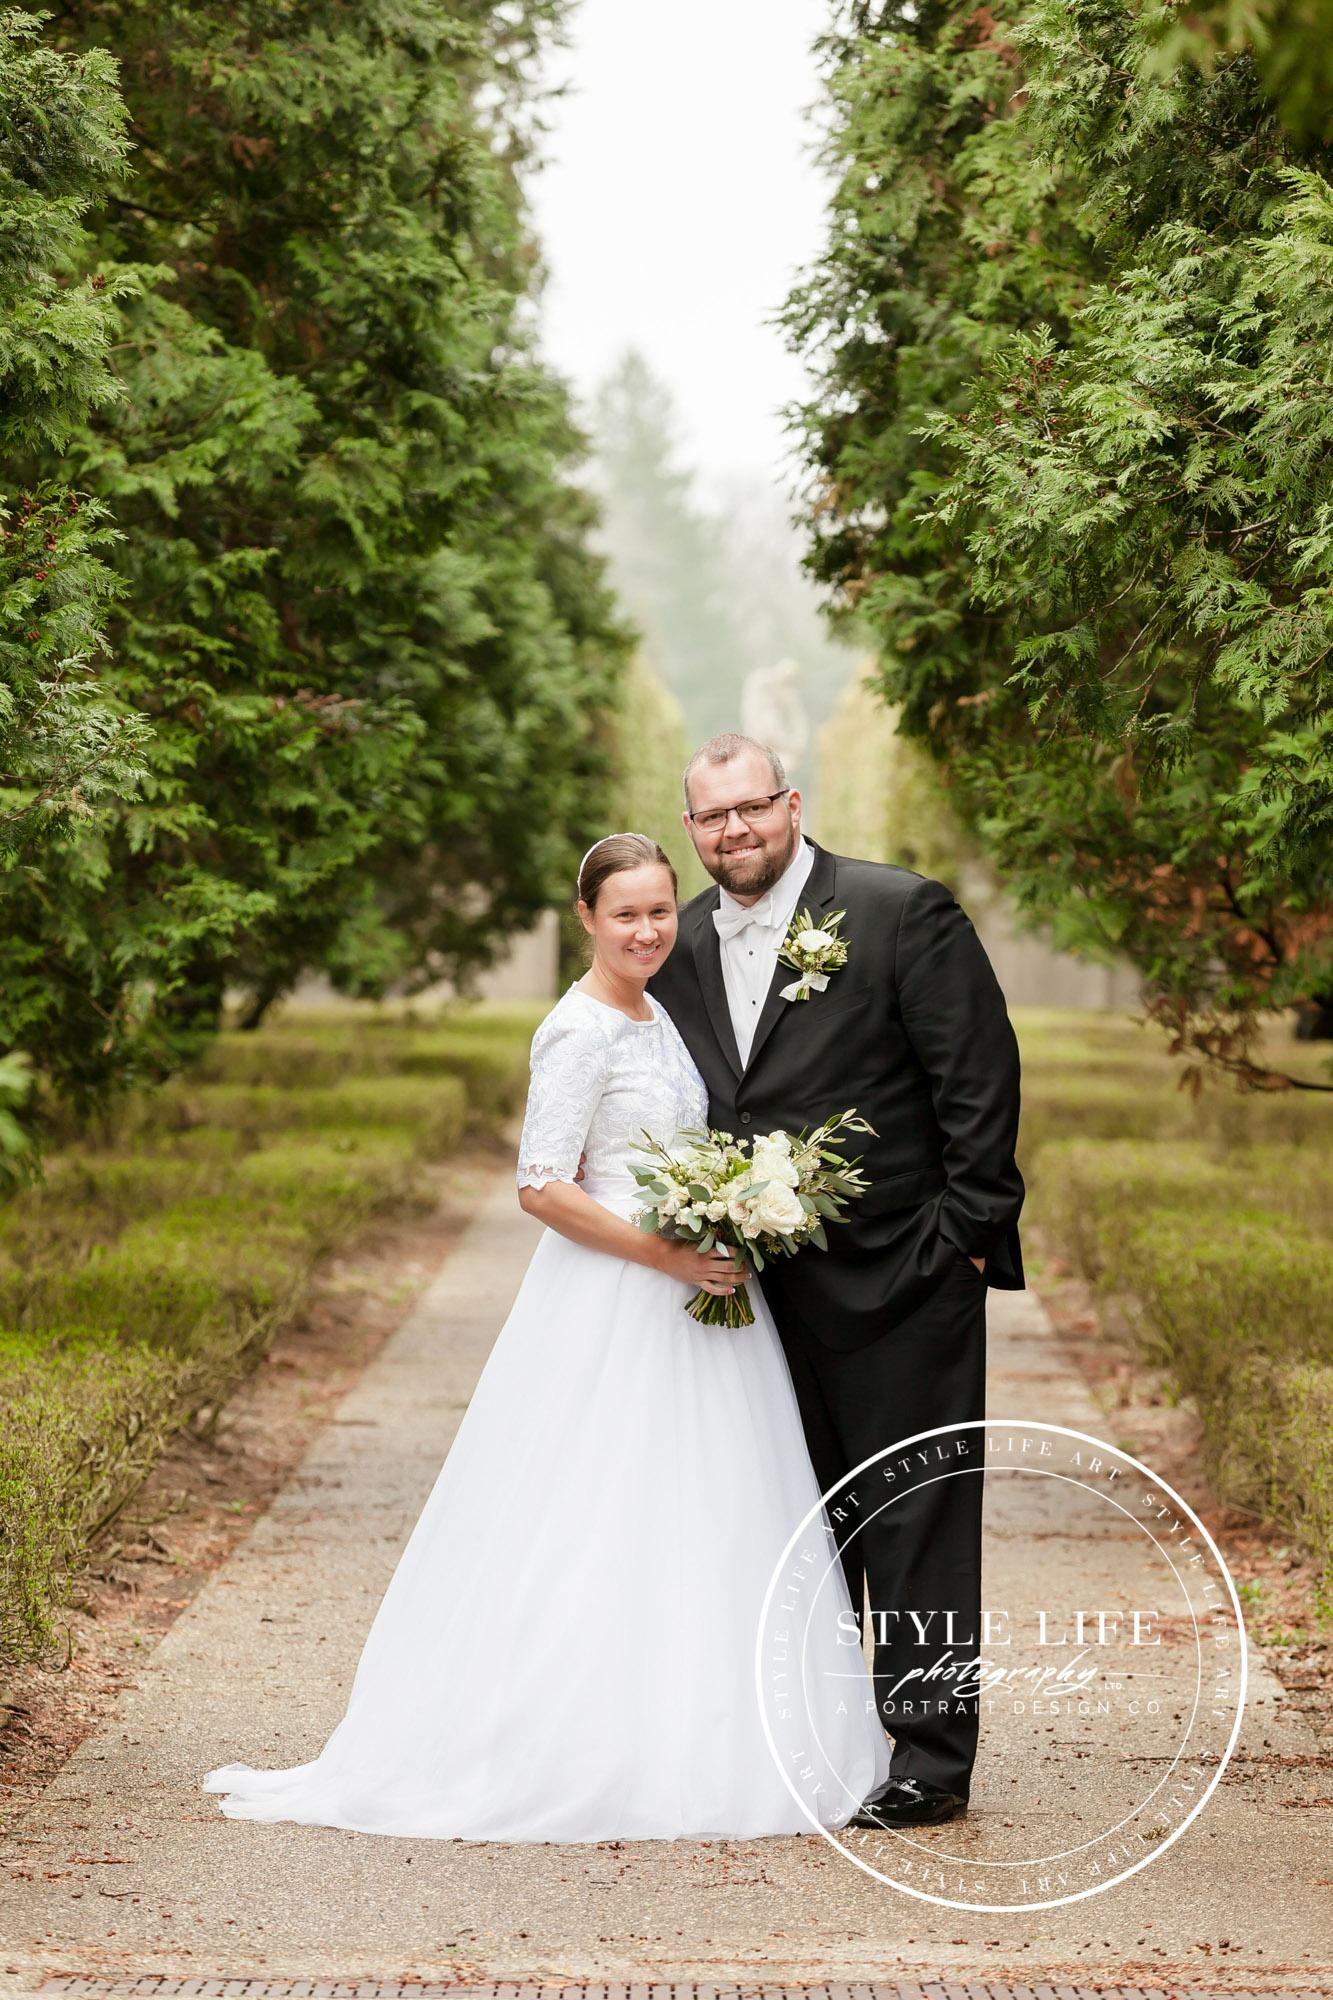 577e072fcc5 Romantic   Rainy Early Spring Wedding - Cynthia   Nevin - Style Life ...